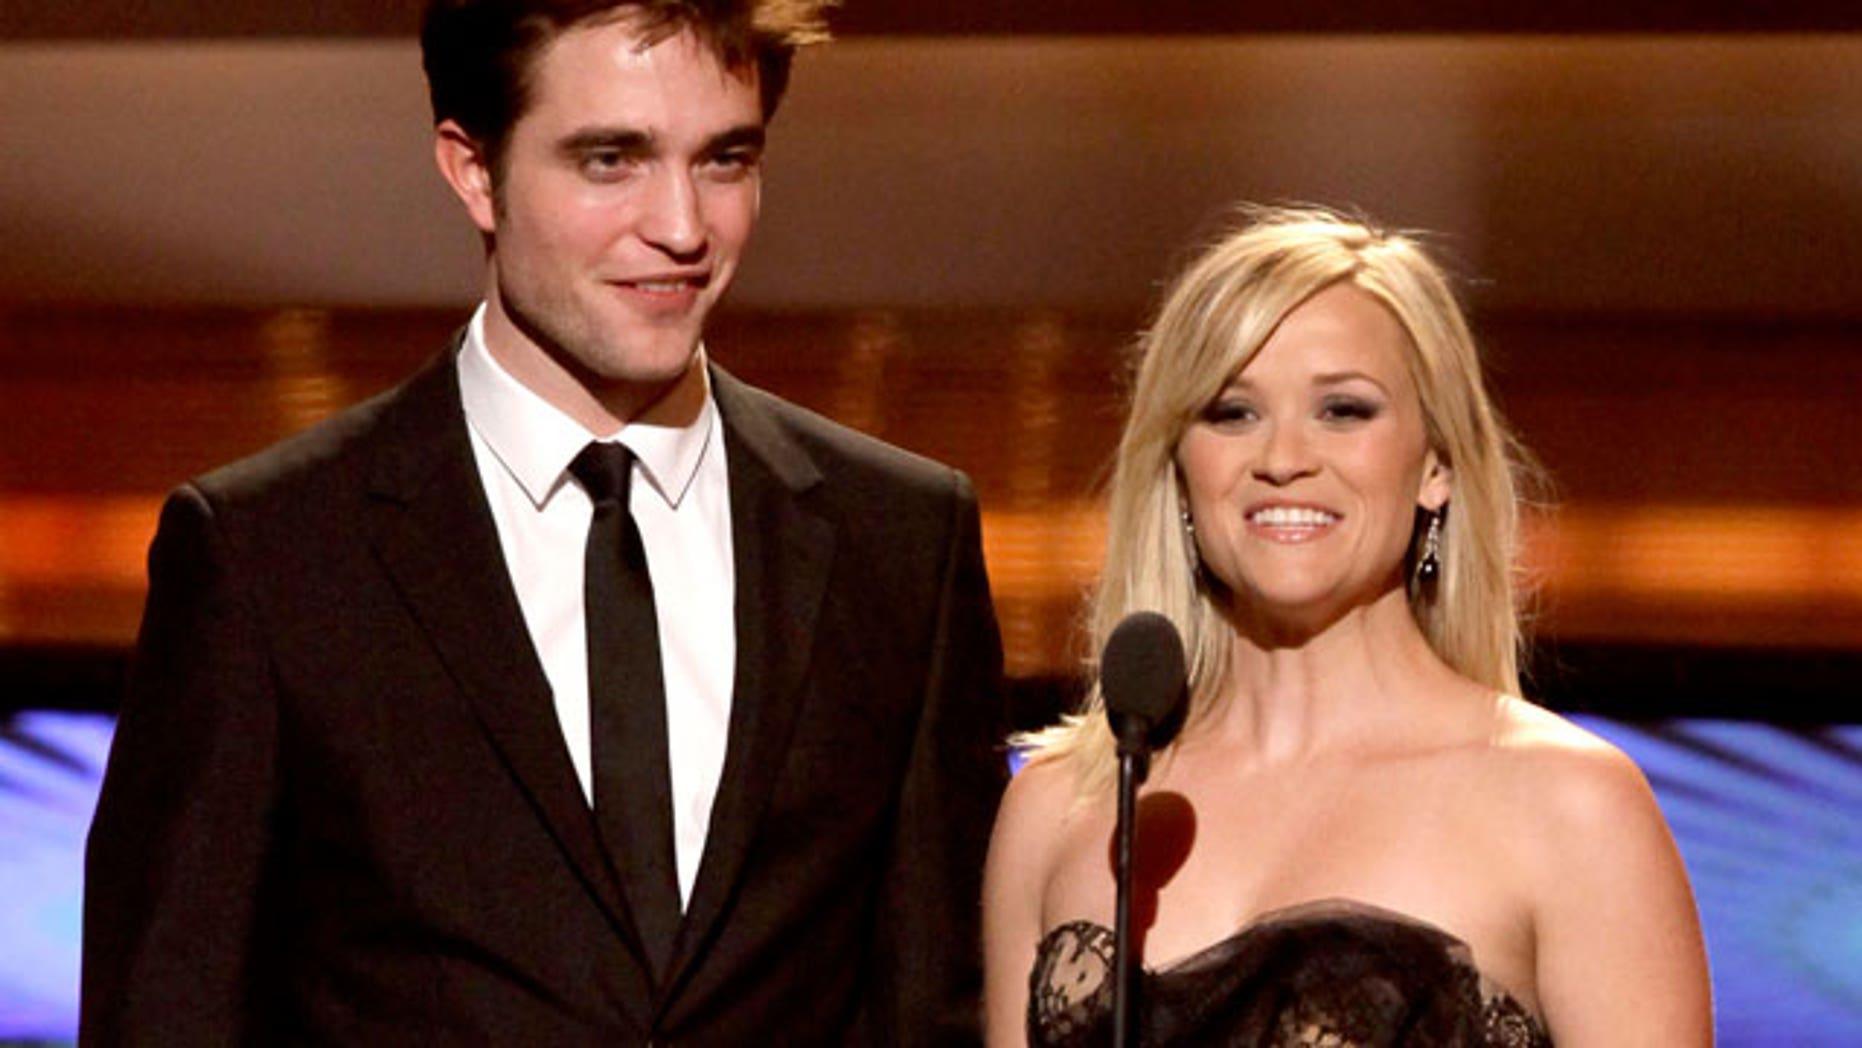 MTV Movie Awards 2011: Robert Pattinson and Reese